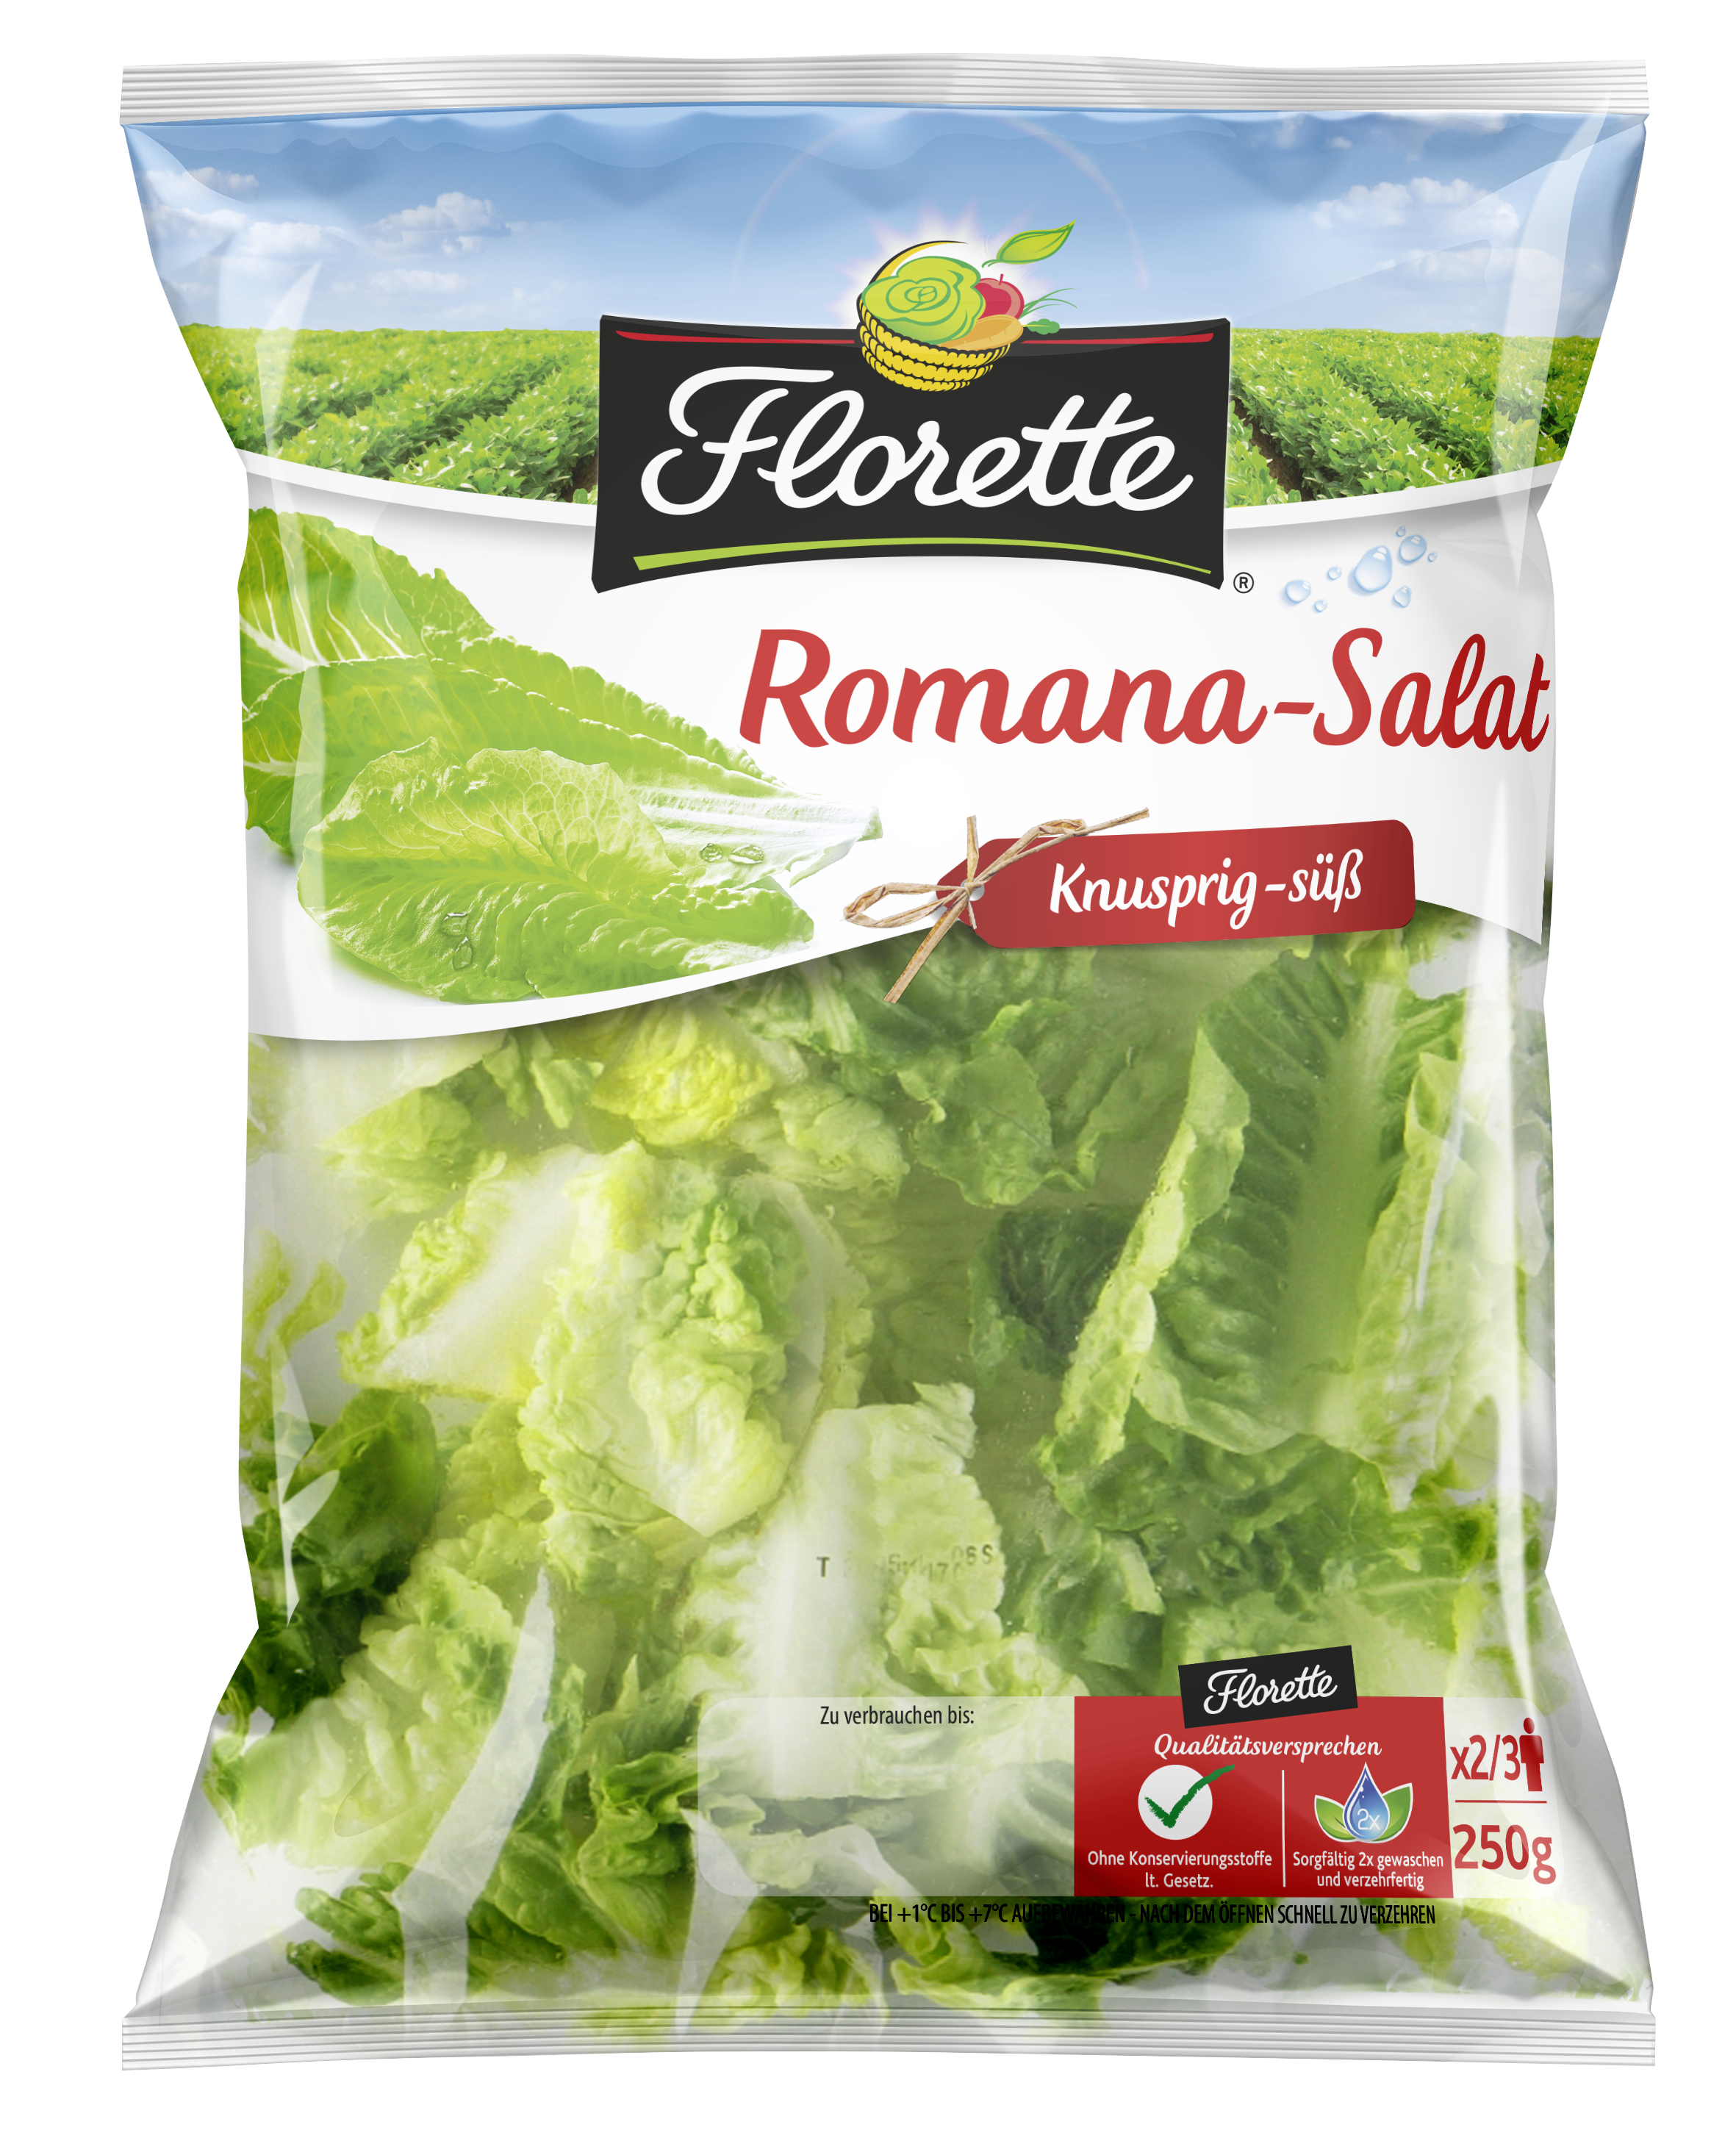 Florette Romana-Salat